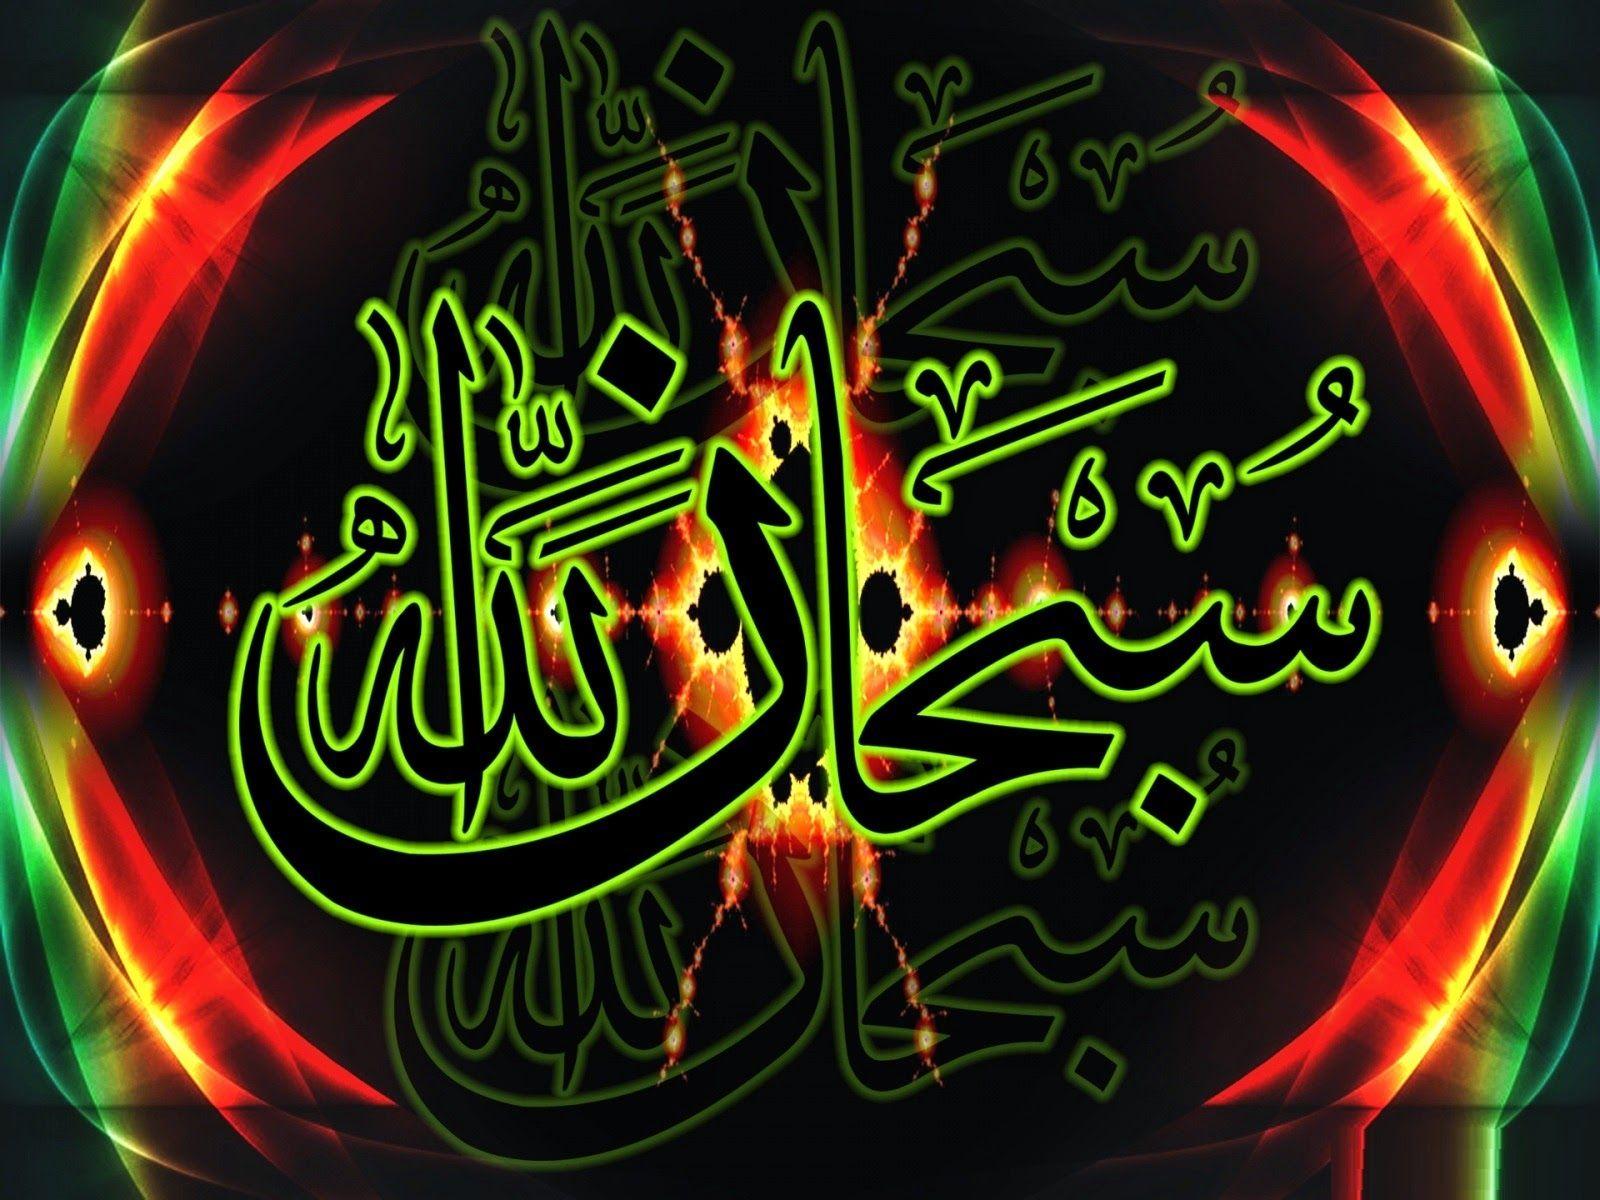 Subhan Allah Calligraphy Wallpapers 2014 Islamic Wallpapers Kaaba Madina Ramadan Eid Calligraphy Mosques In 2021 Allah Wallpaper Calligraphy Wallpaper Allah